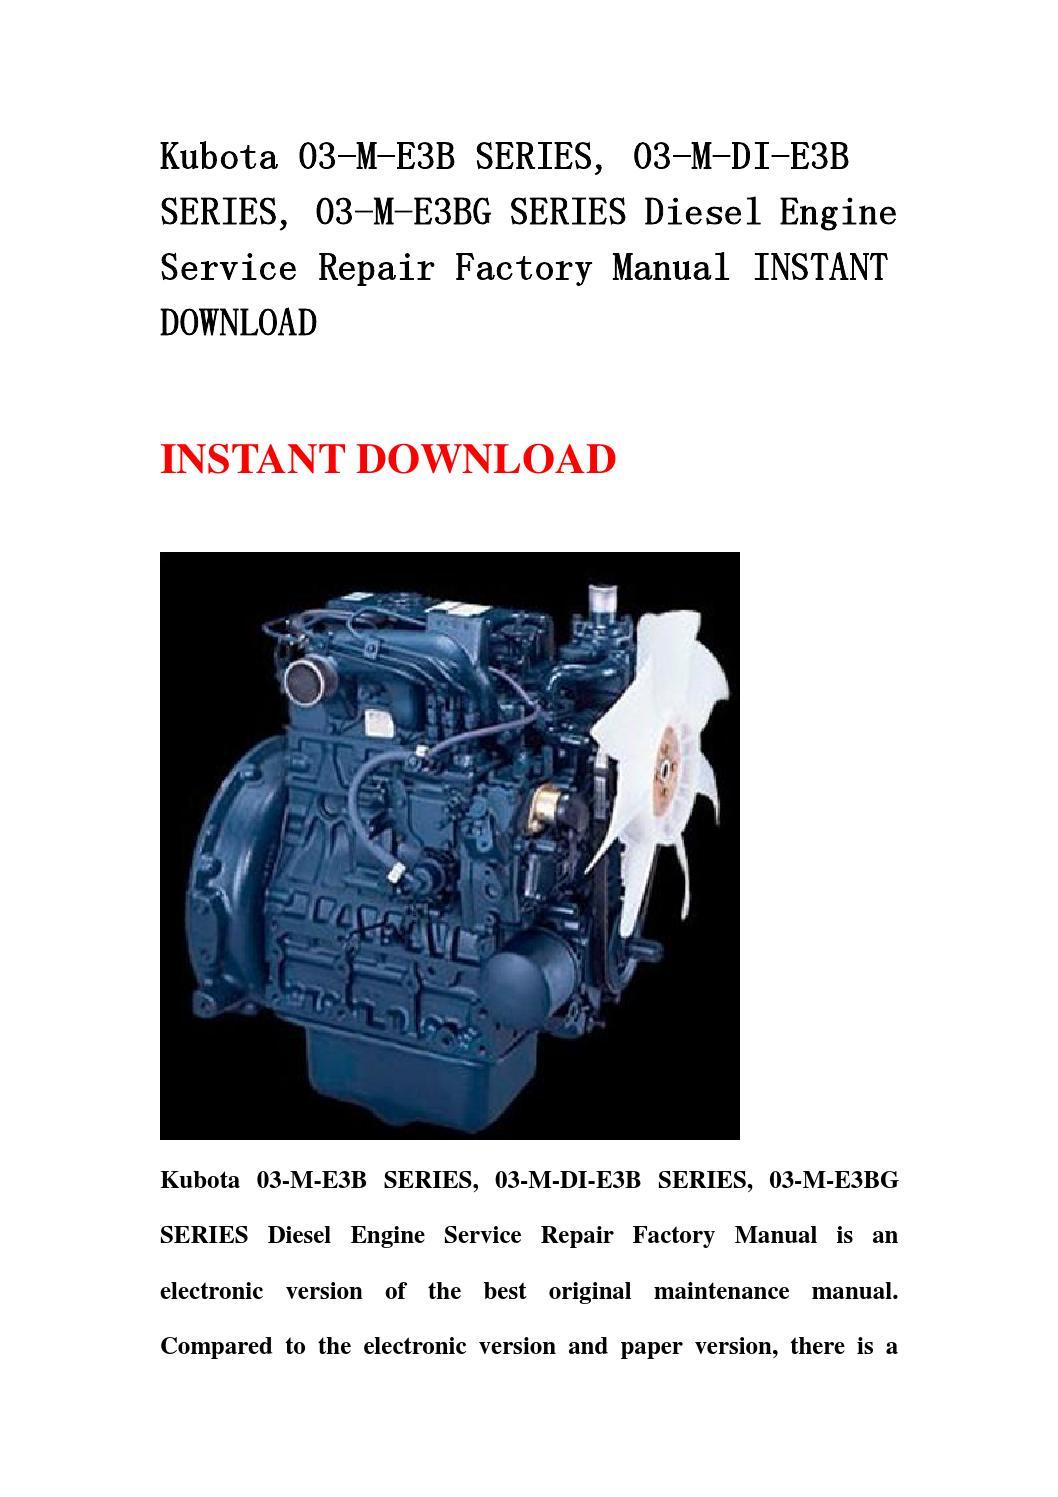 Kubota 03 m e3b series, 03 m di e3b series, 03 m e3bg series diesel engine  service repair factory ma by hsgefbhen - issuu